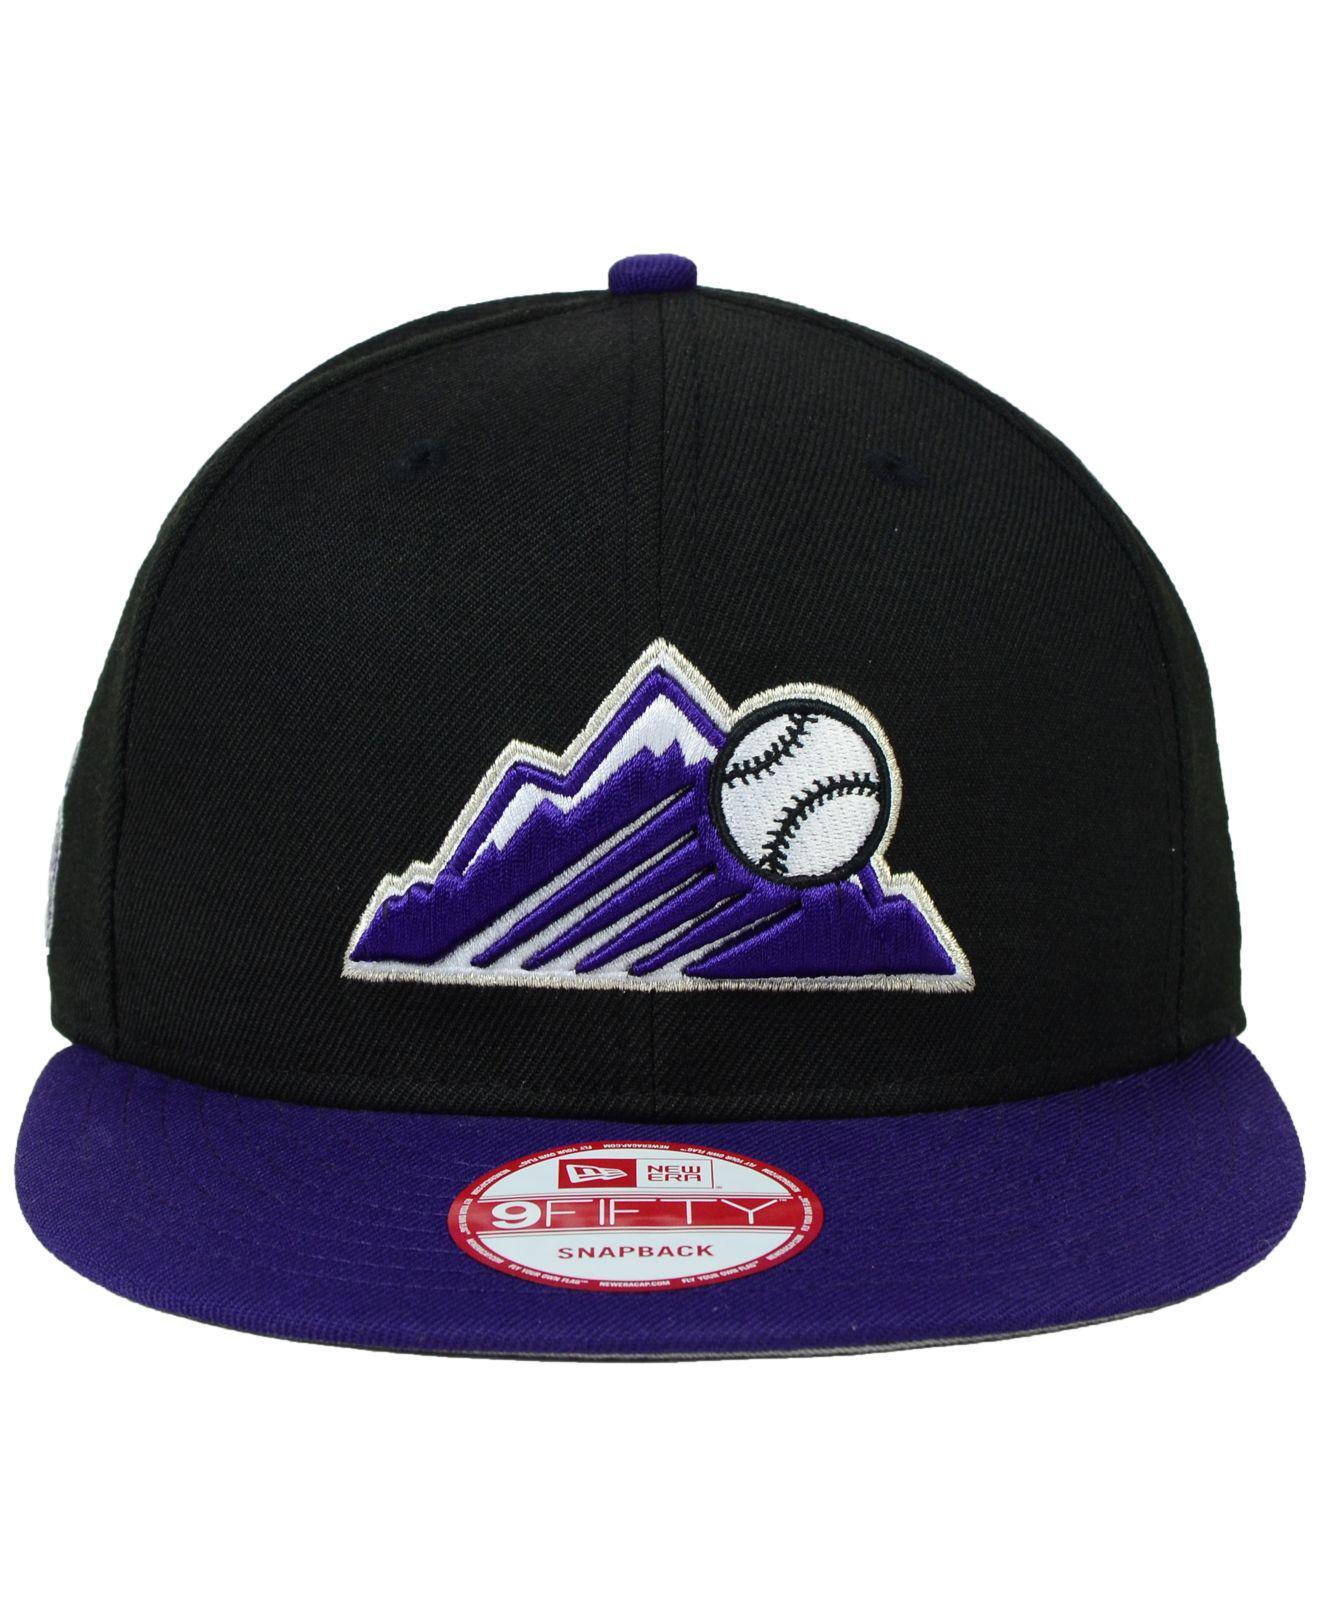 df906e8ff6d Lyst - KTZ Colorado Rockies 2-tone Link 9fifty Snapback Cap in Purple for  Men